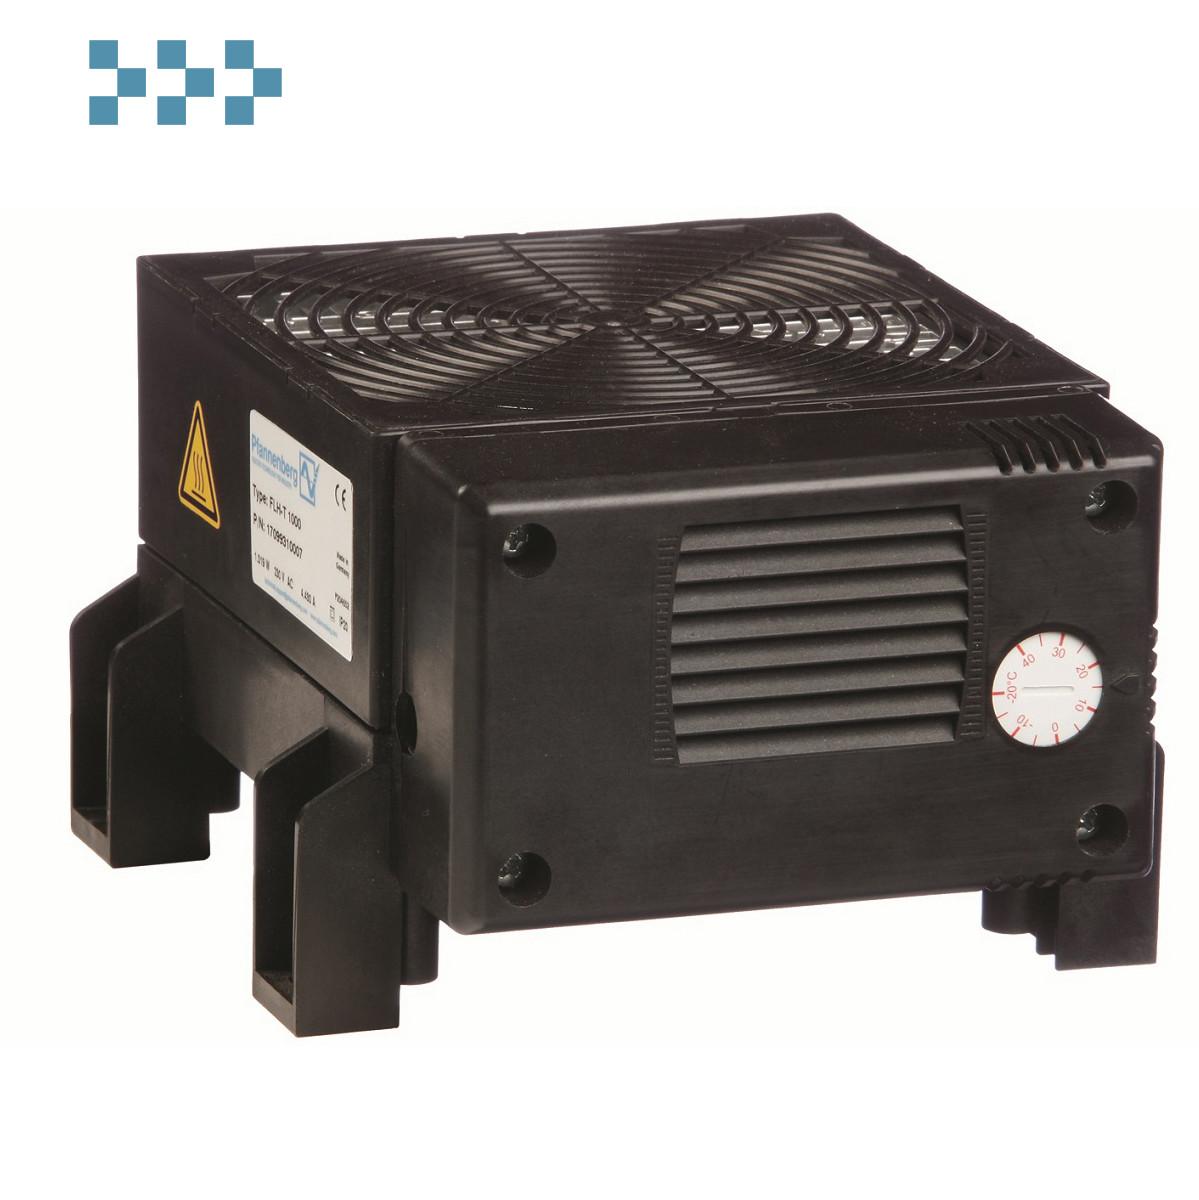 Компактный нагреватель ЦМО FLH-T 400 Heater 230V